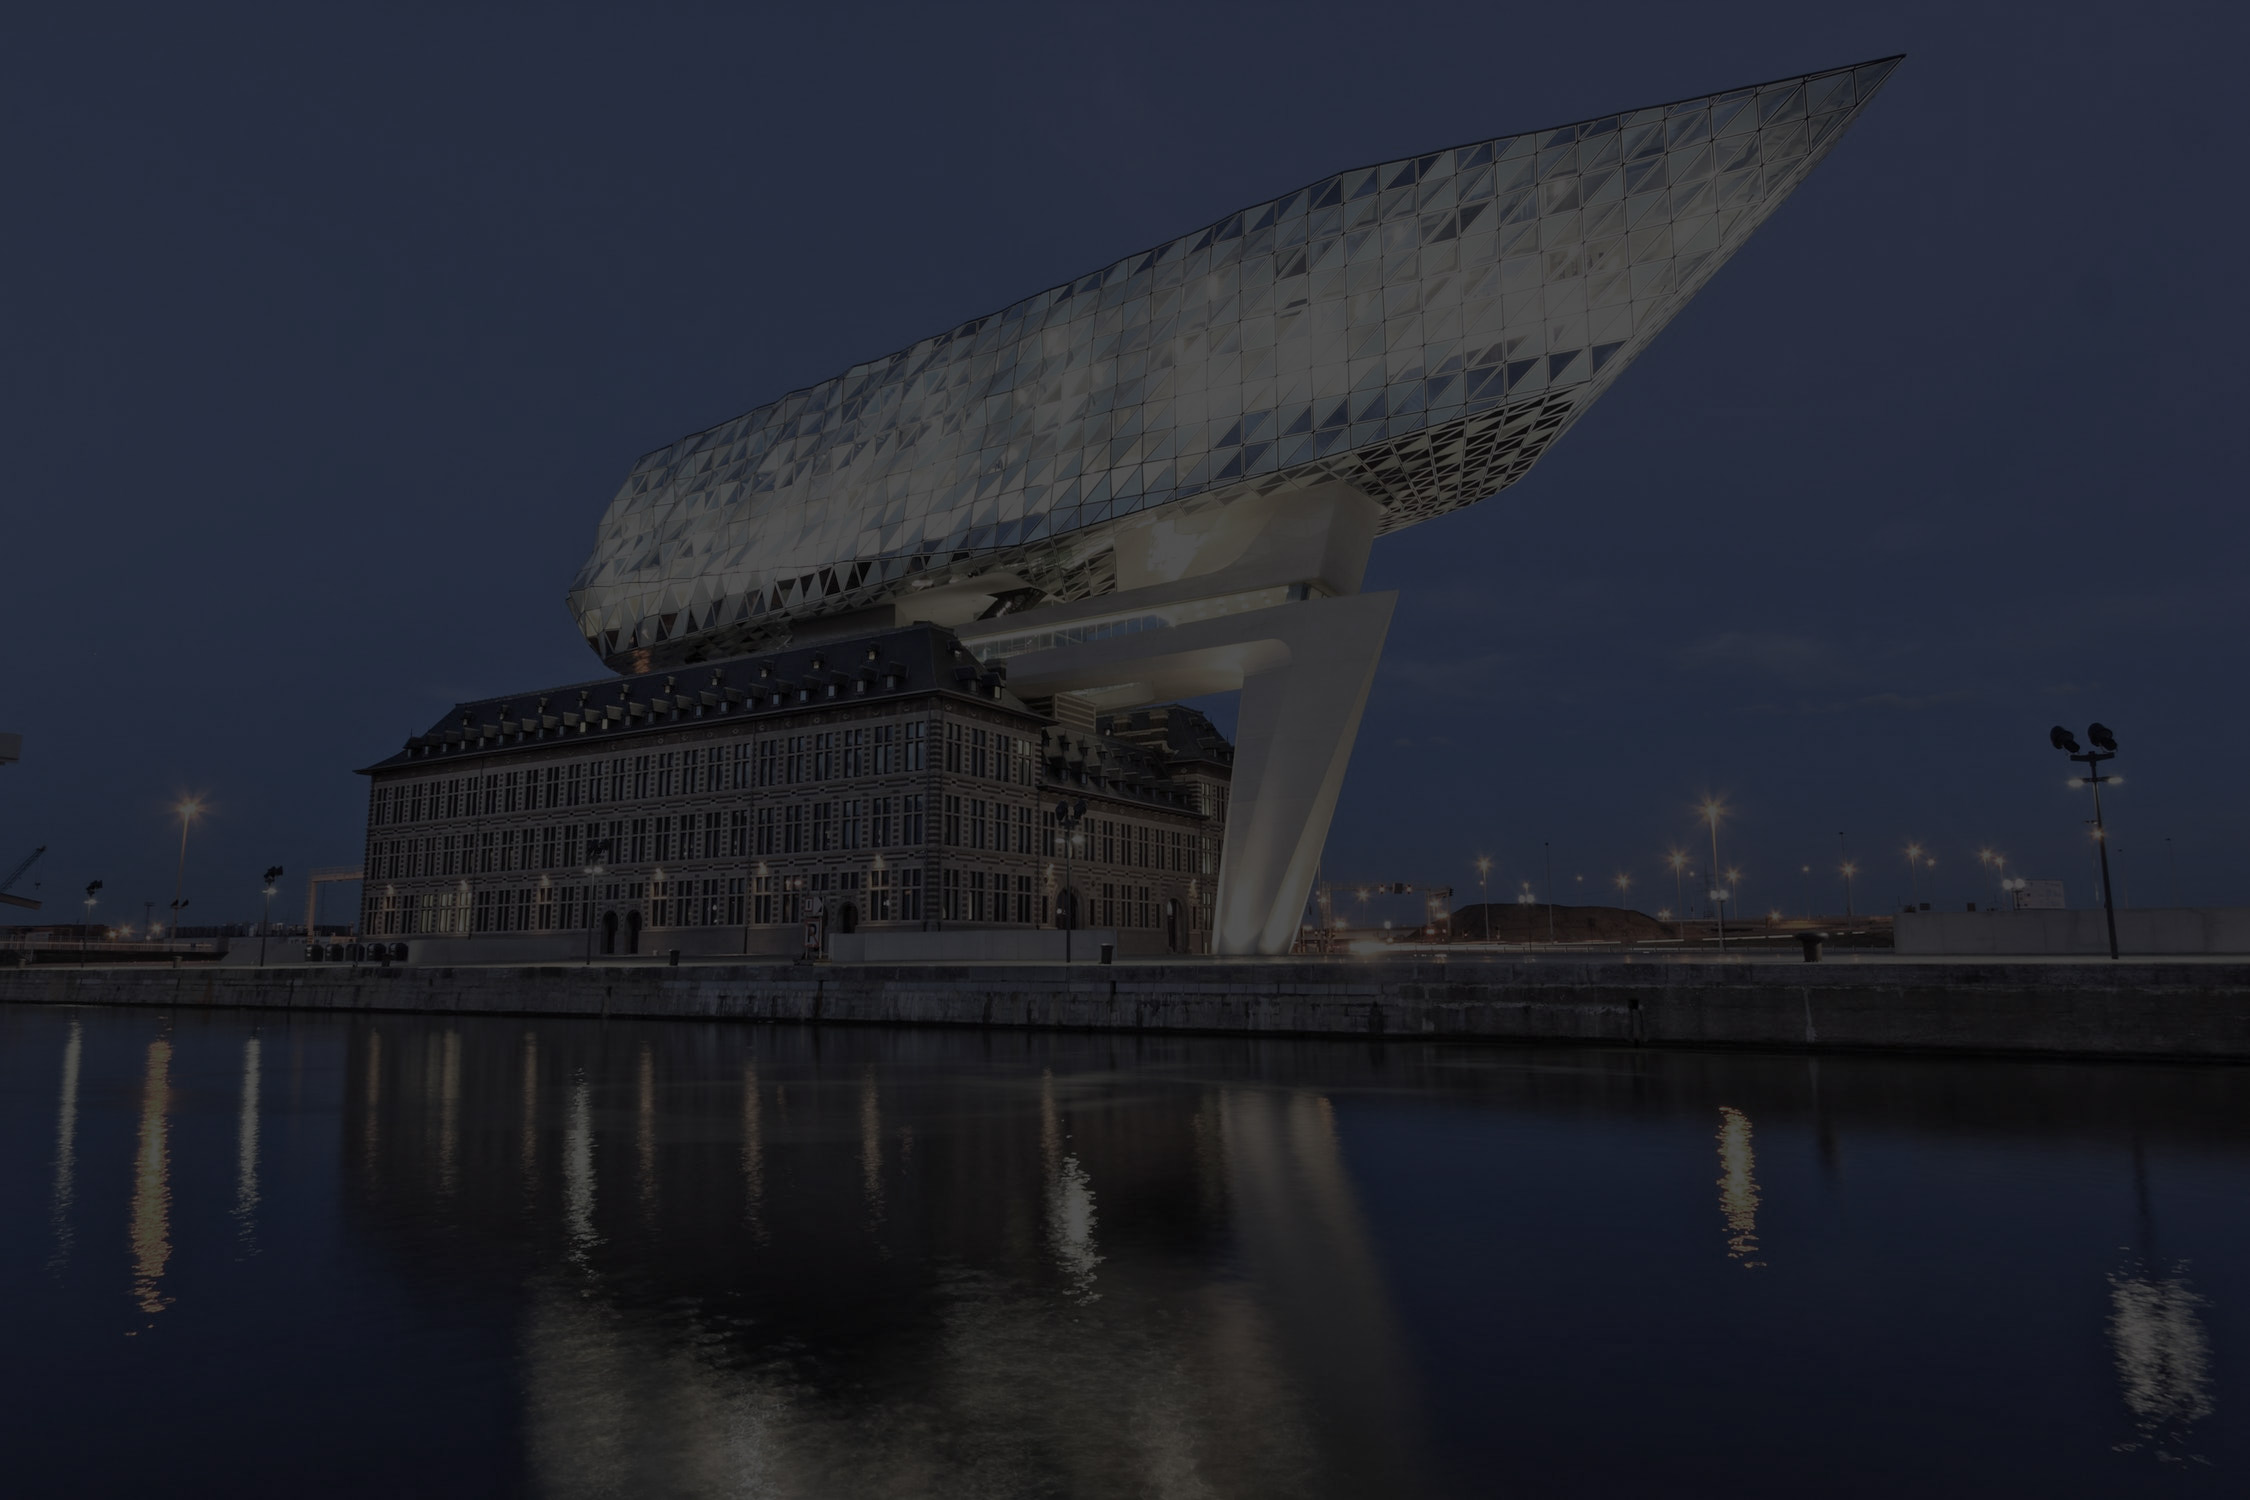 Antwerp-best-Diamonds-Athena-diamond-cut-Antwerpen-Belgie